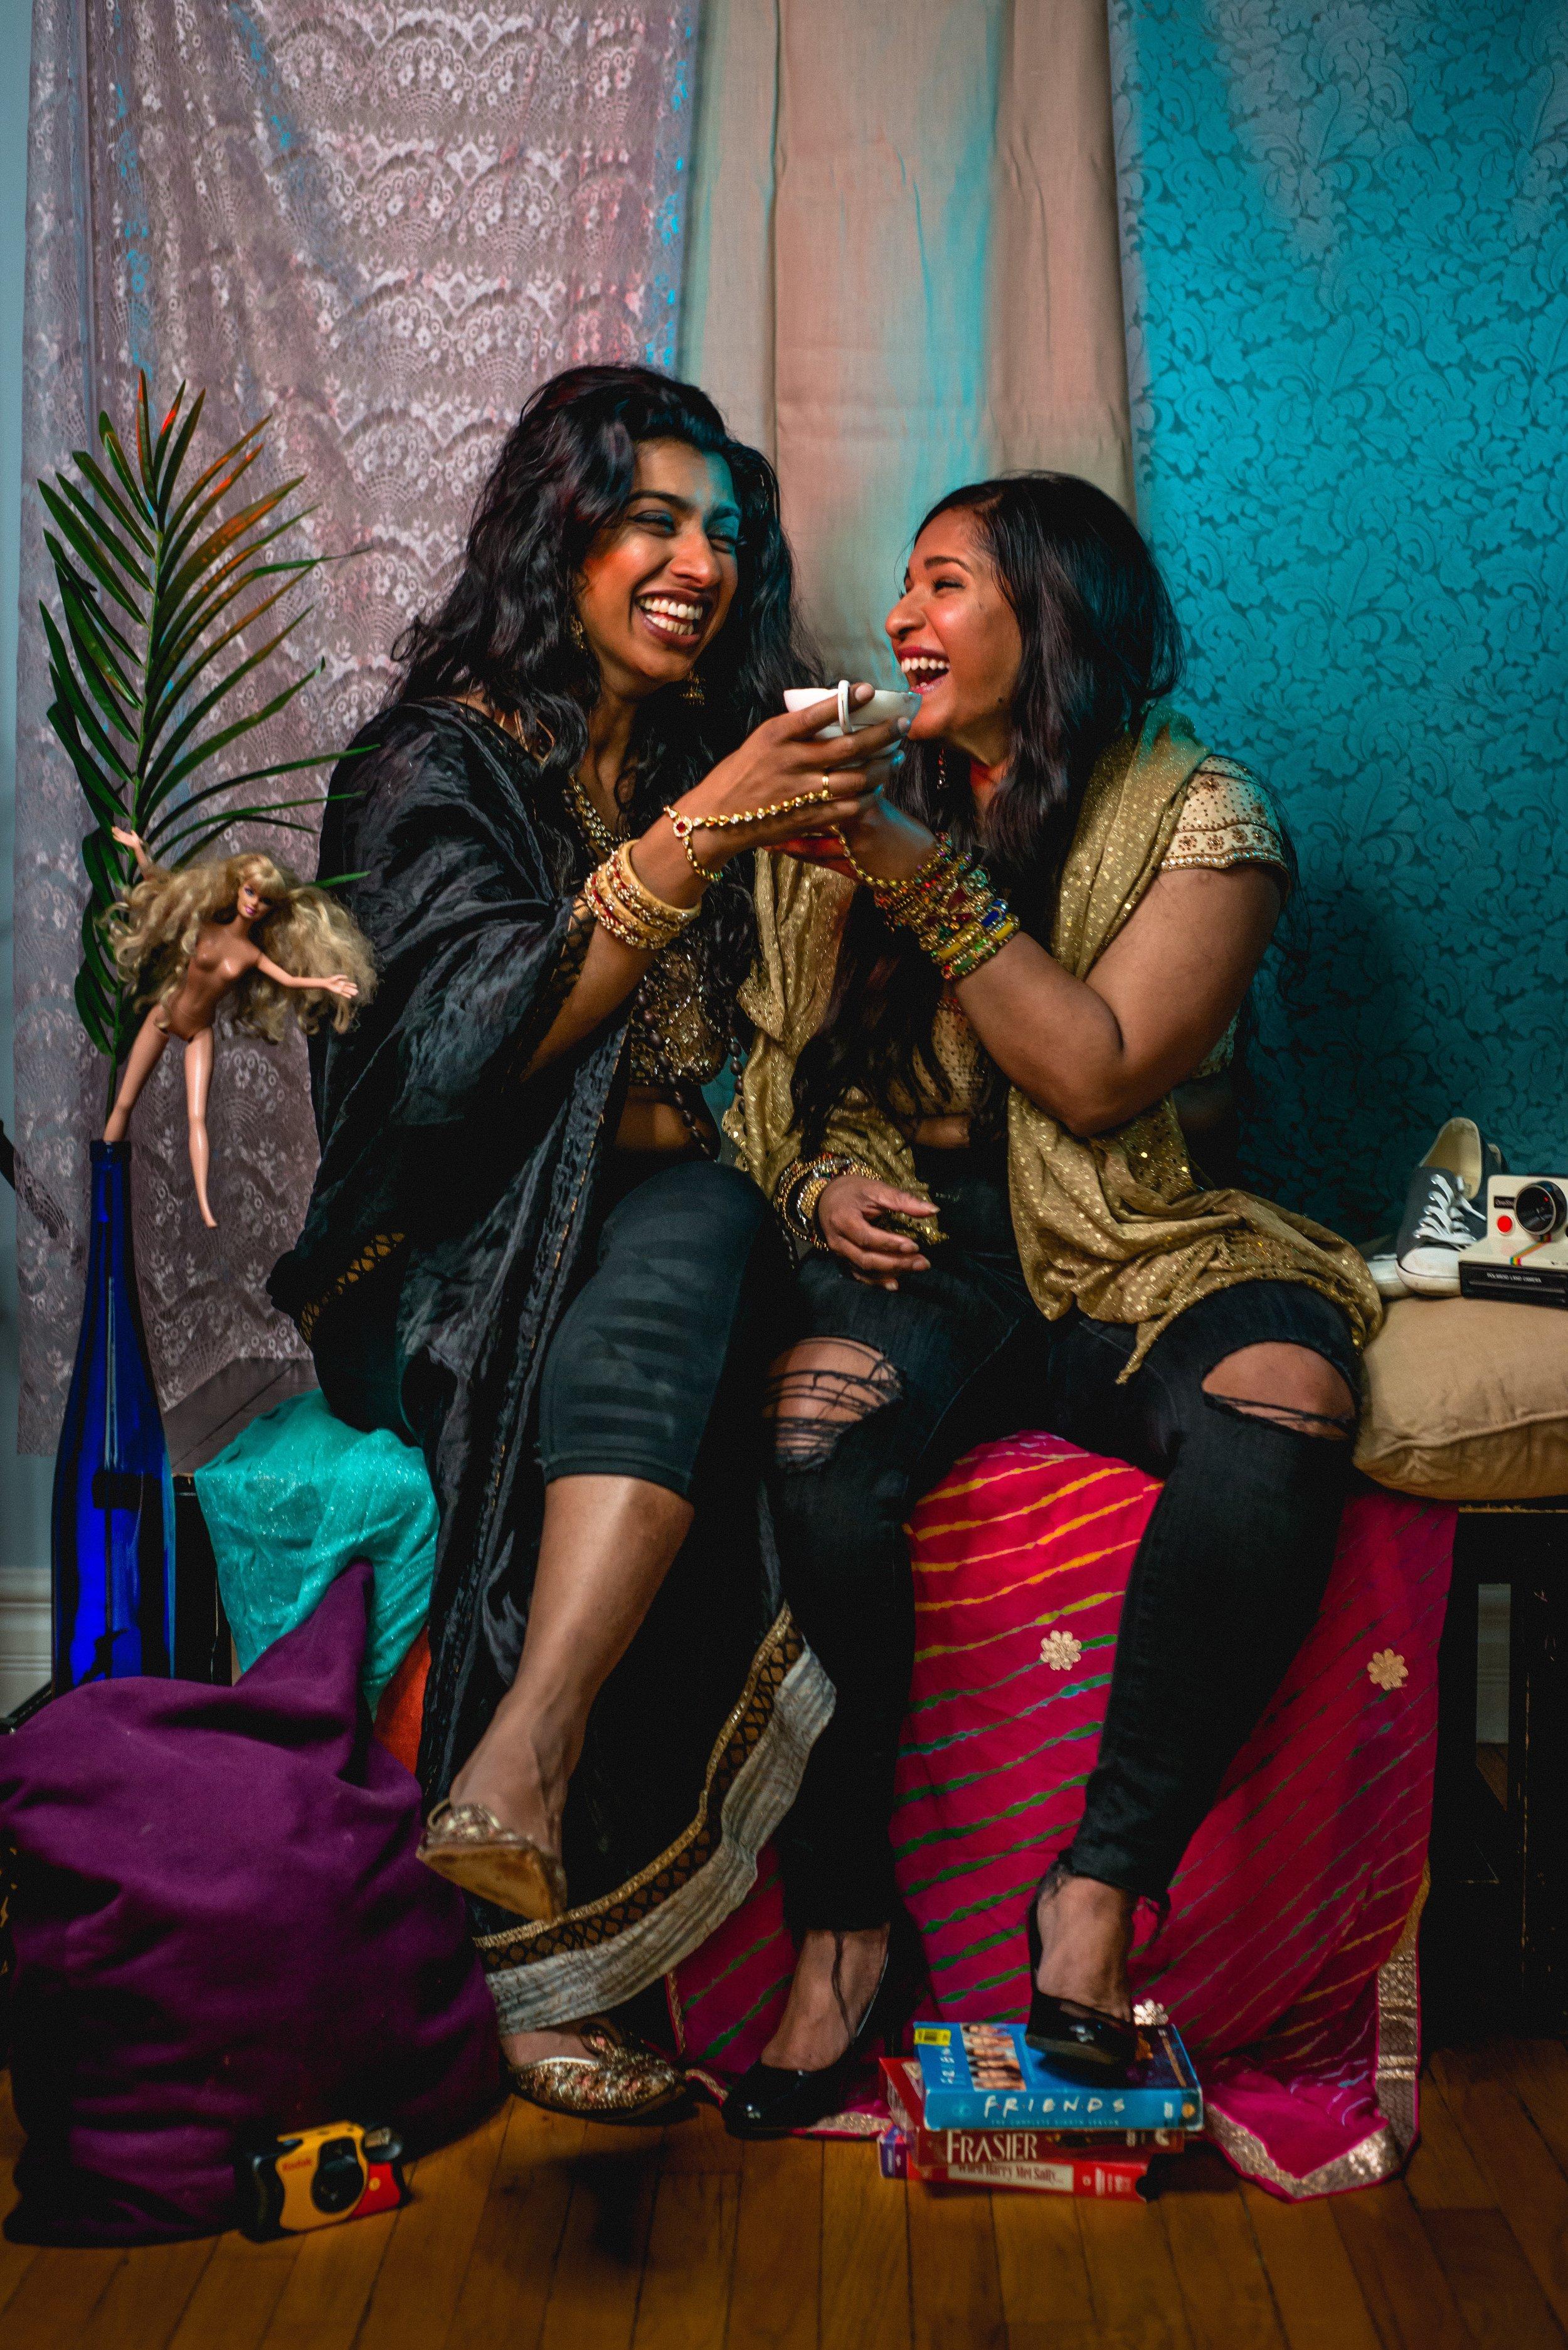 Ranirageradio - by Meg Indurti & Sonal AggarwalA discourse in discomfort